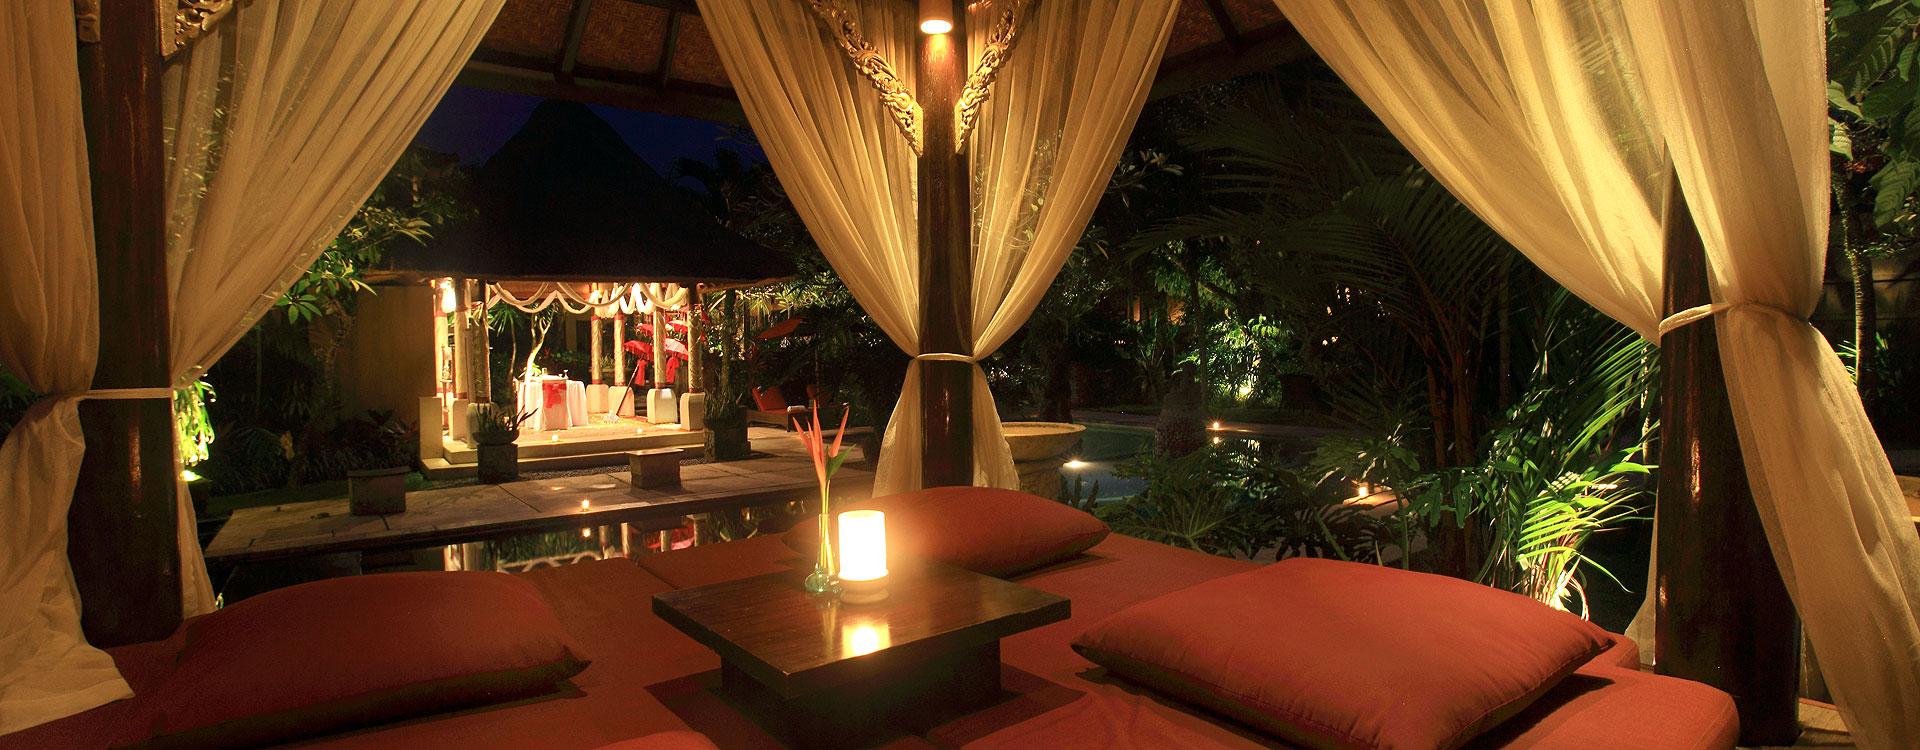 Bebek Tepi Sawah Restaurant And Villas Romantic Candle